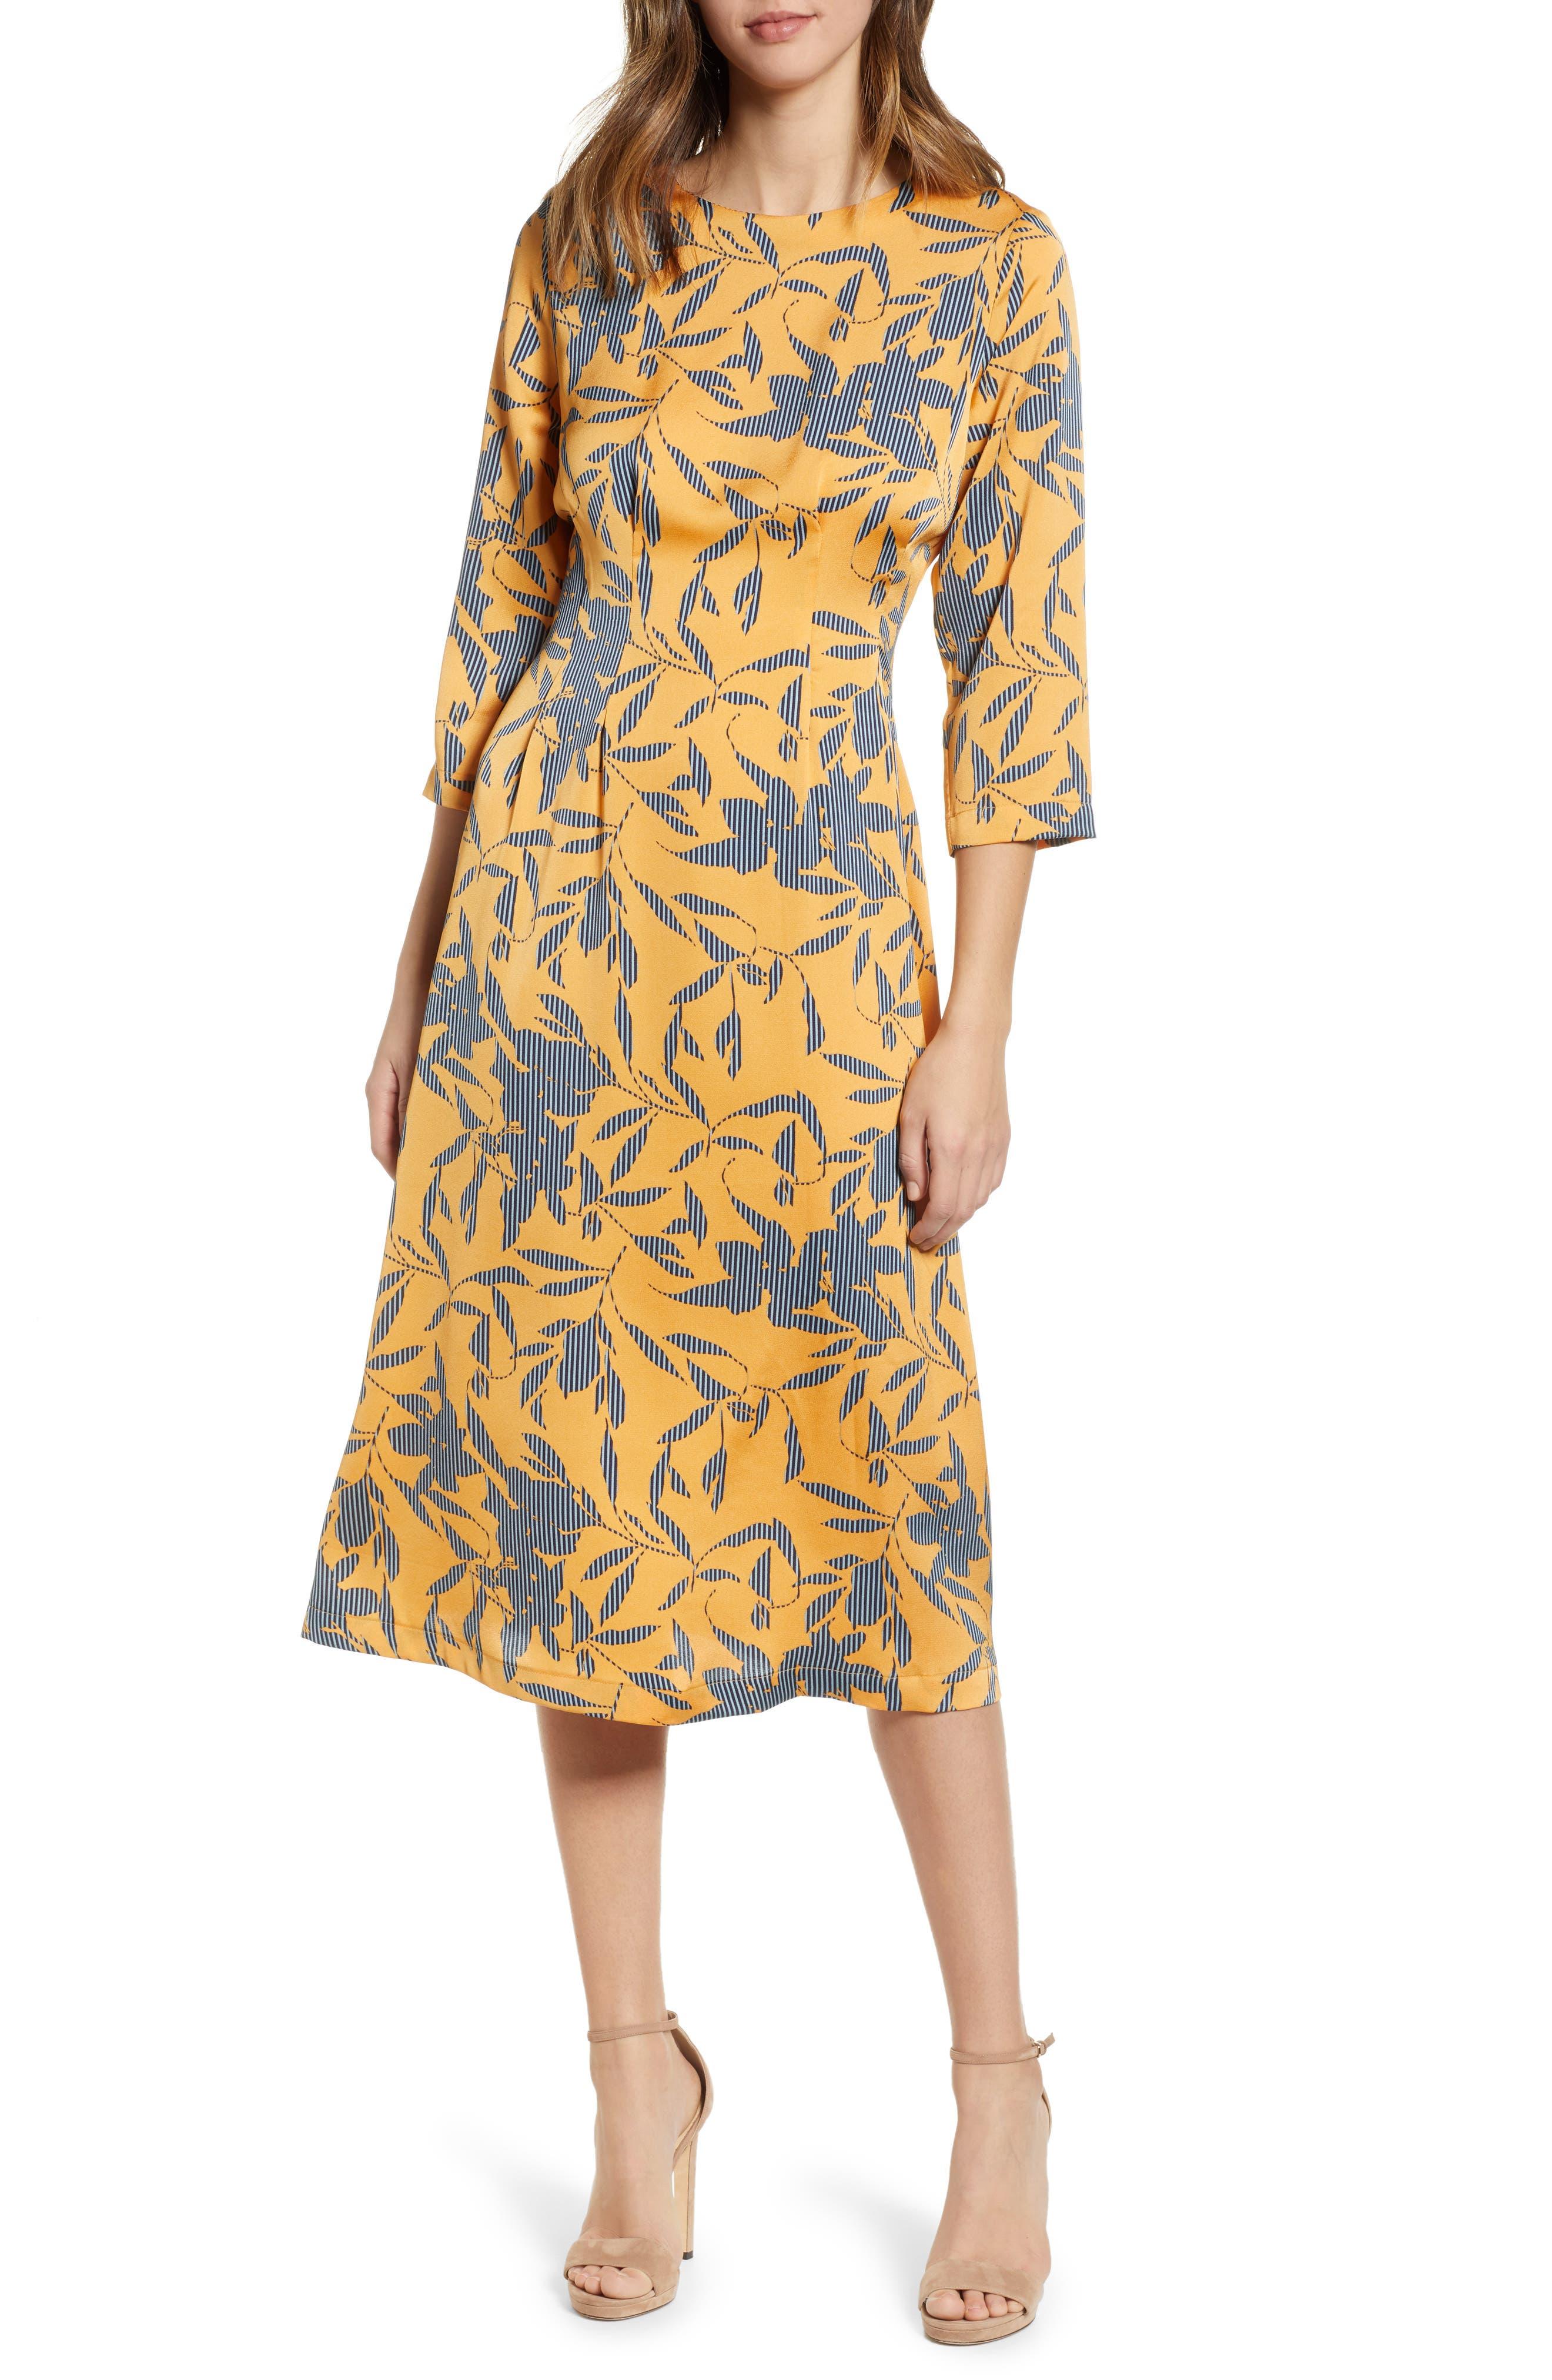 VERO MODA Olivia A-Line Dress in Golden Nugget